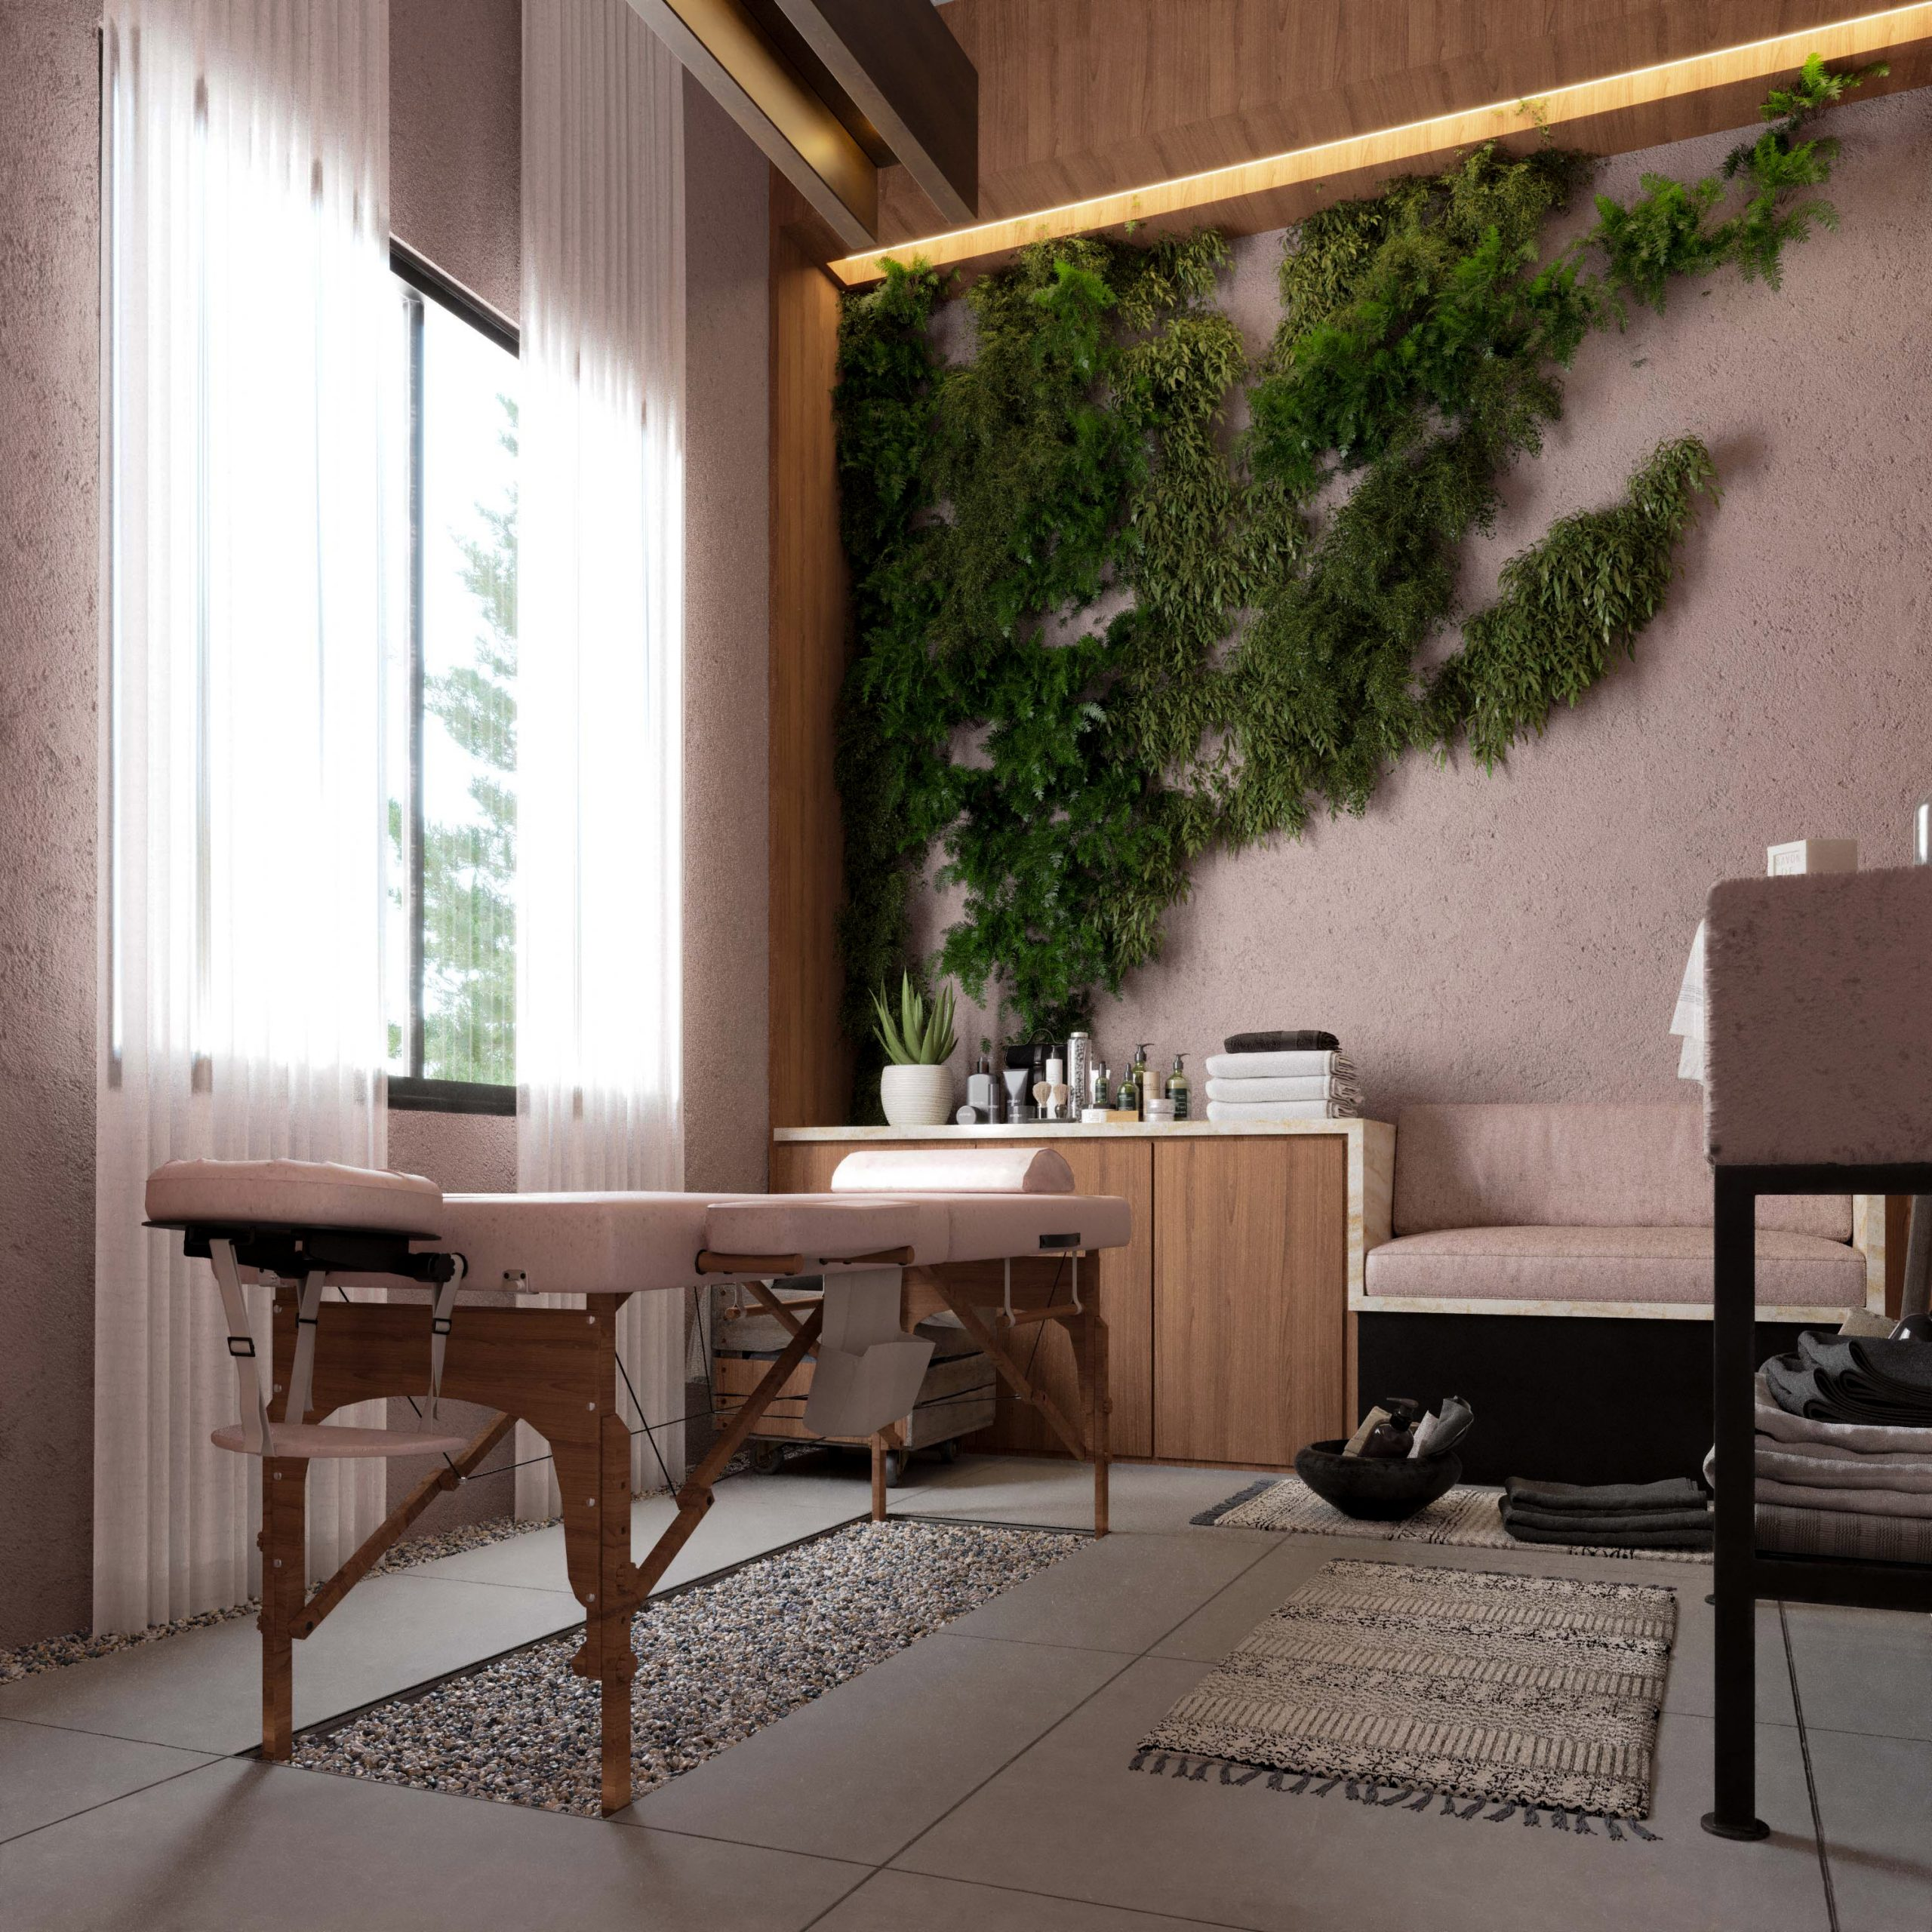 massage section - spa - ocean spa - plants